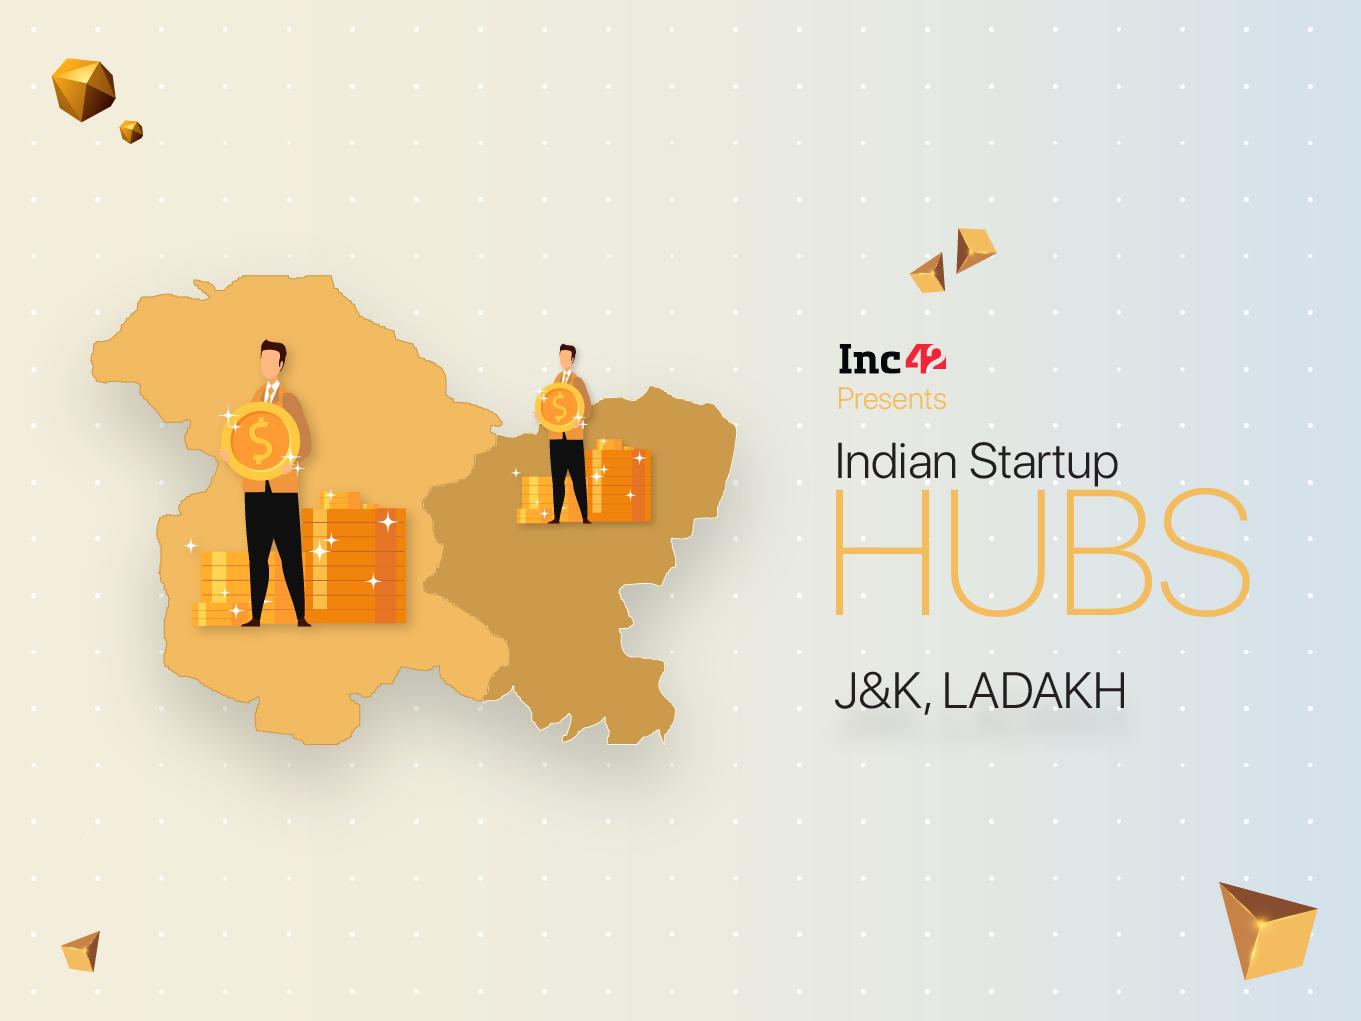 J&K, Ladakh Startup Ecosystem: Financing Is A Bigger Challenge